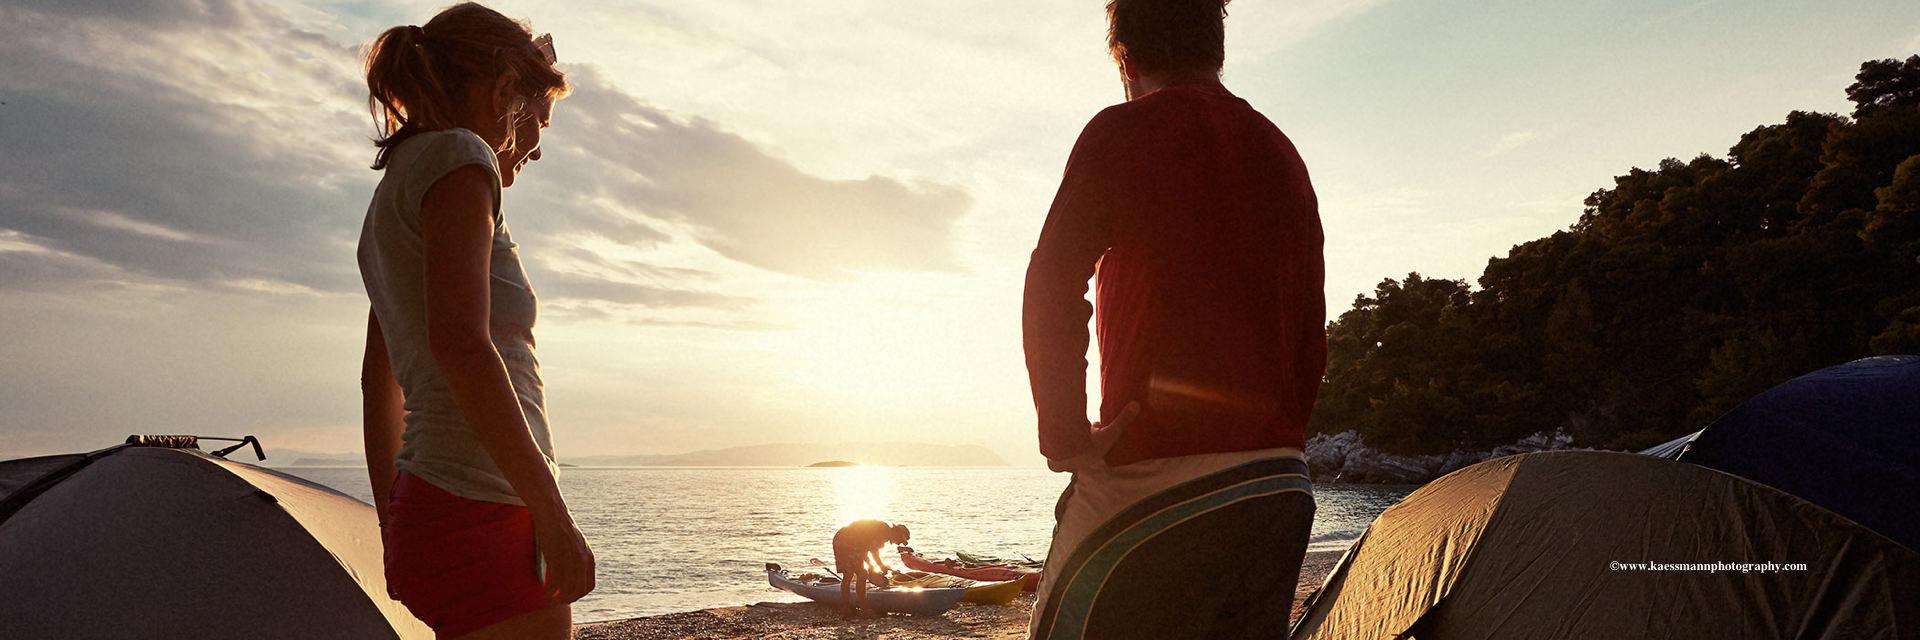 sea-kayak-expedition-image